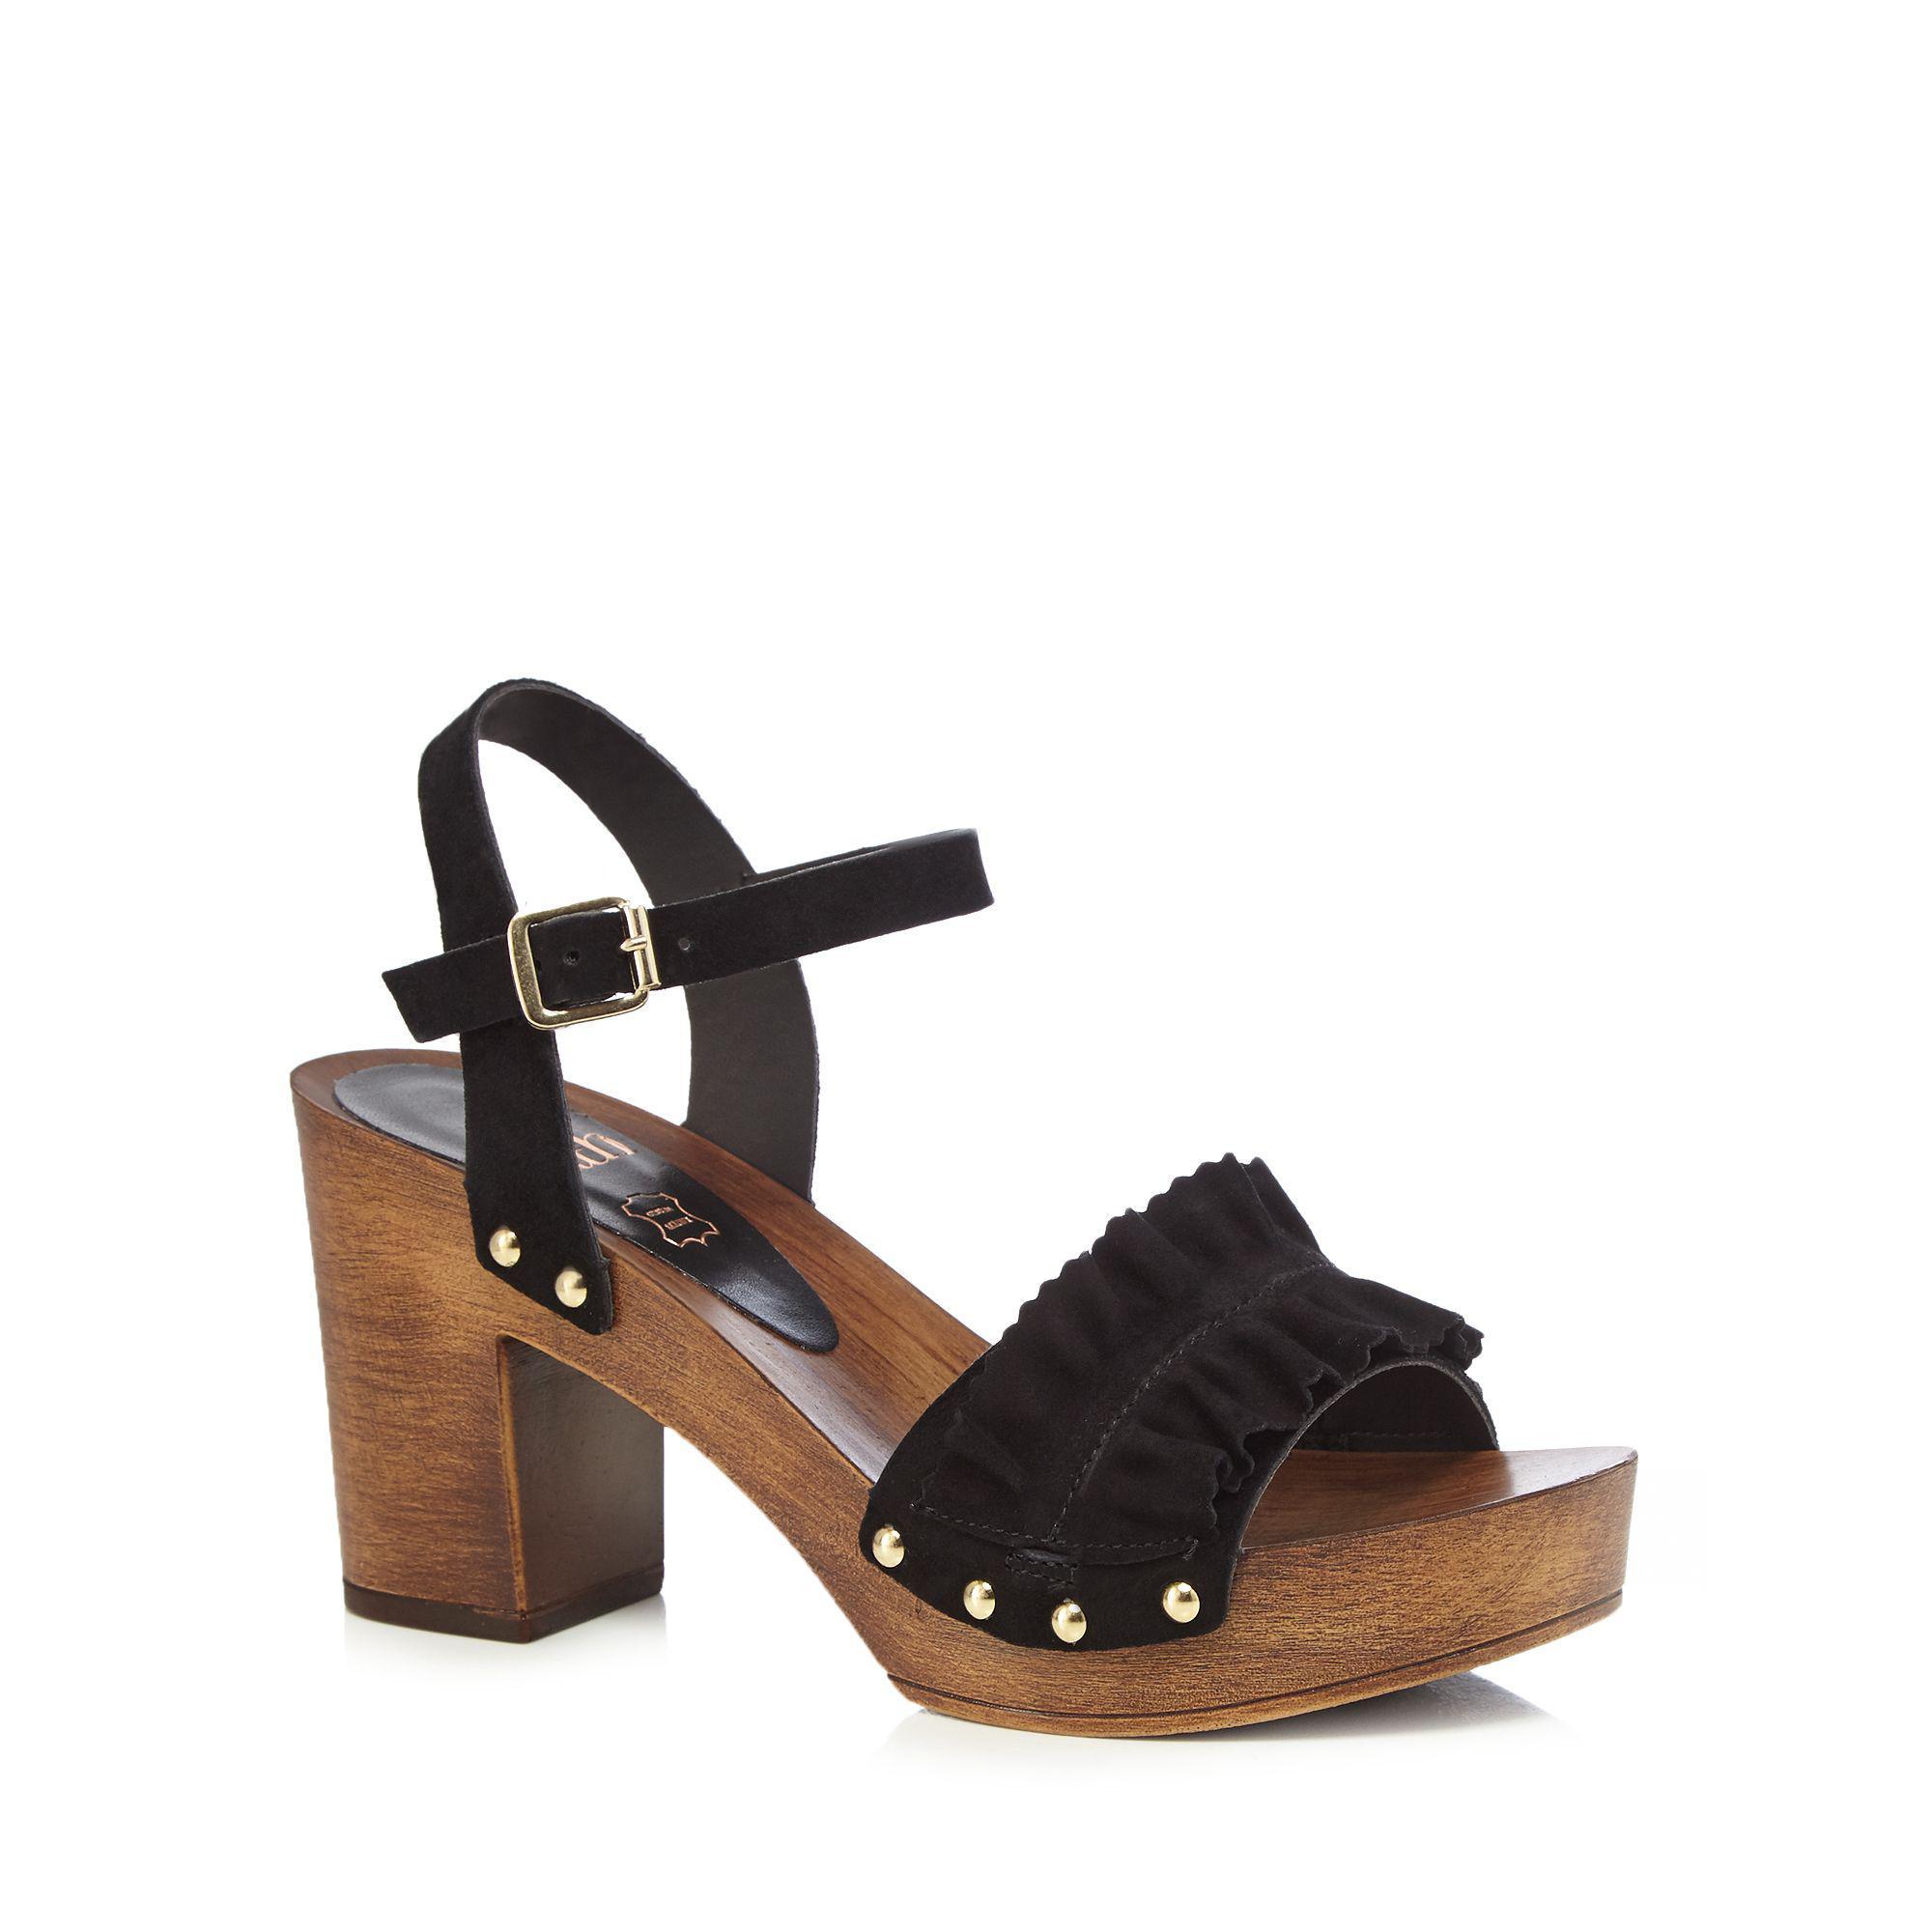 9c0862e7d0fb Faith - Black Suede  dani  High Block Heel Ankle Strap Sandals - Lyst. View  fullscreen